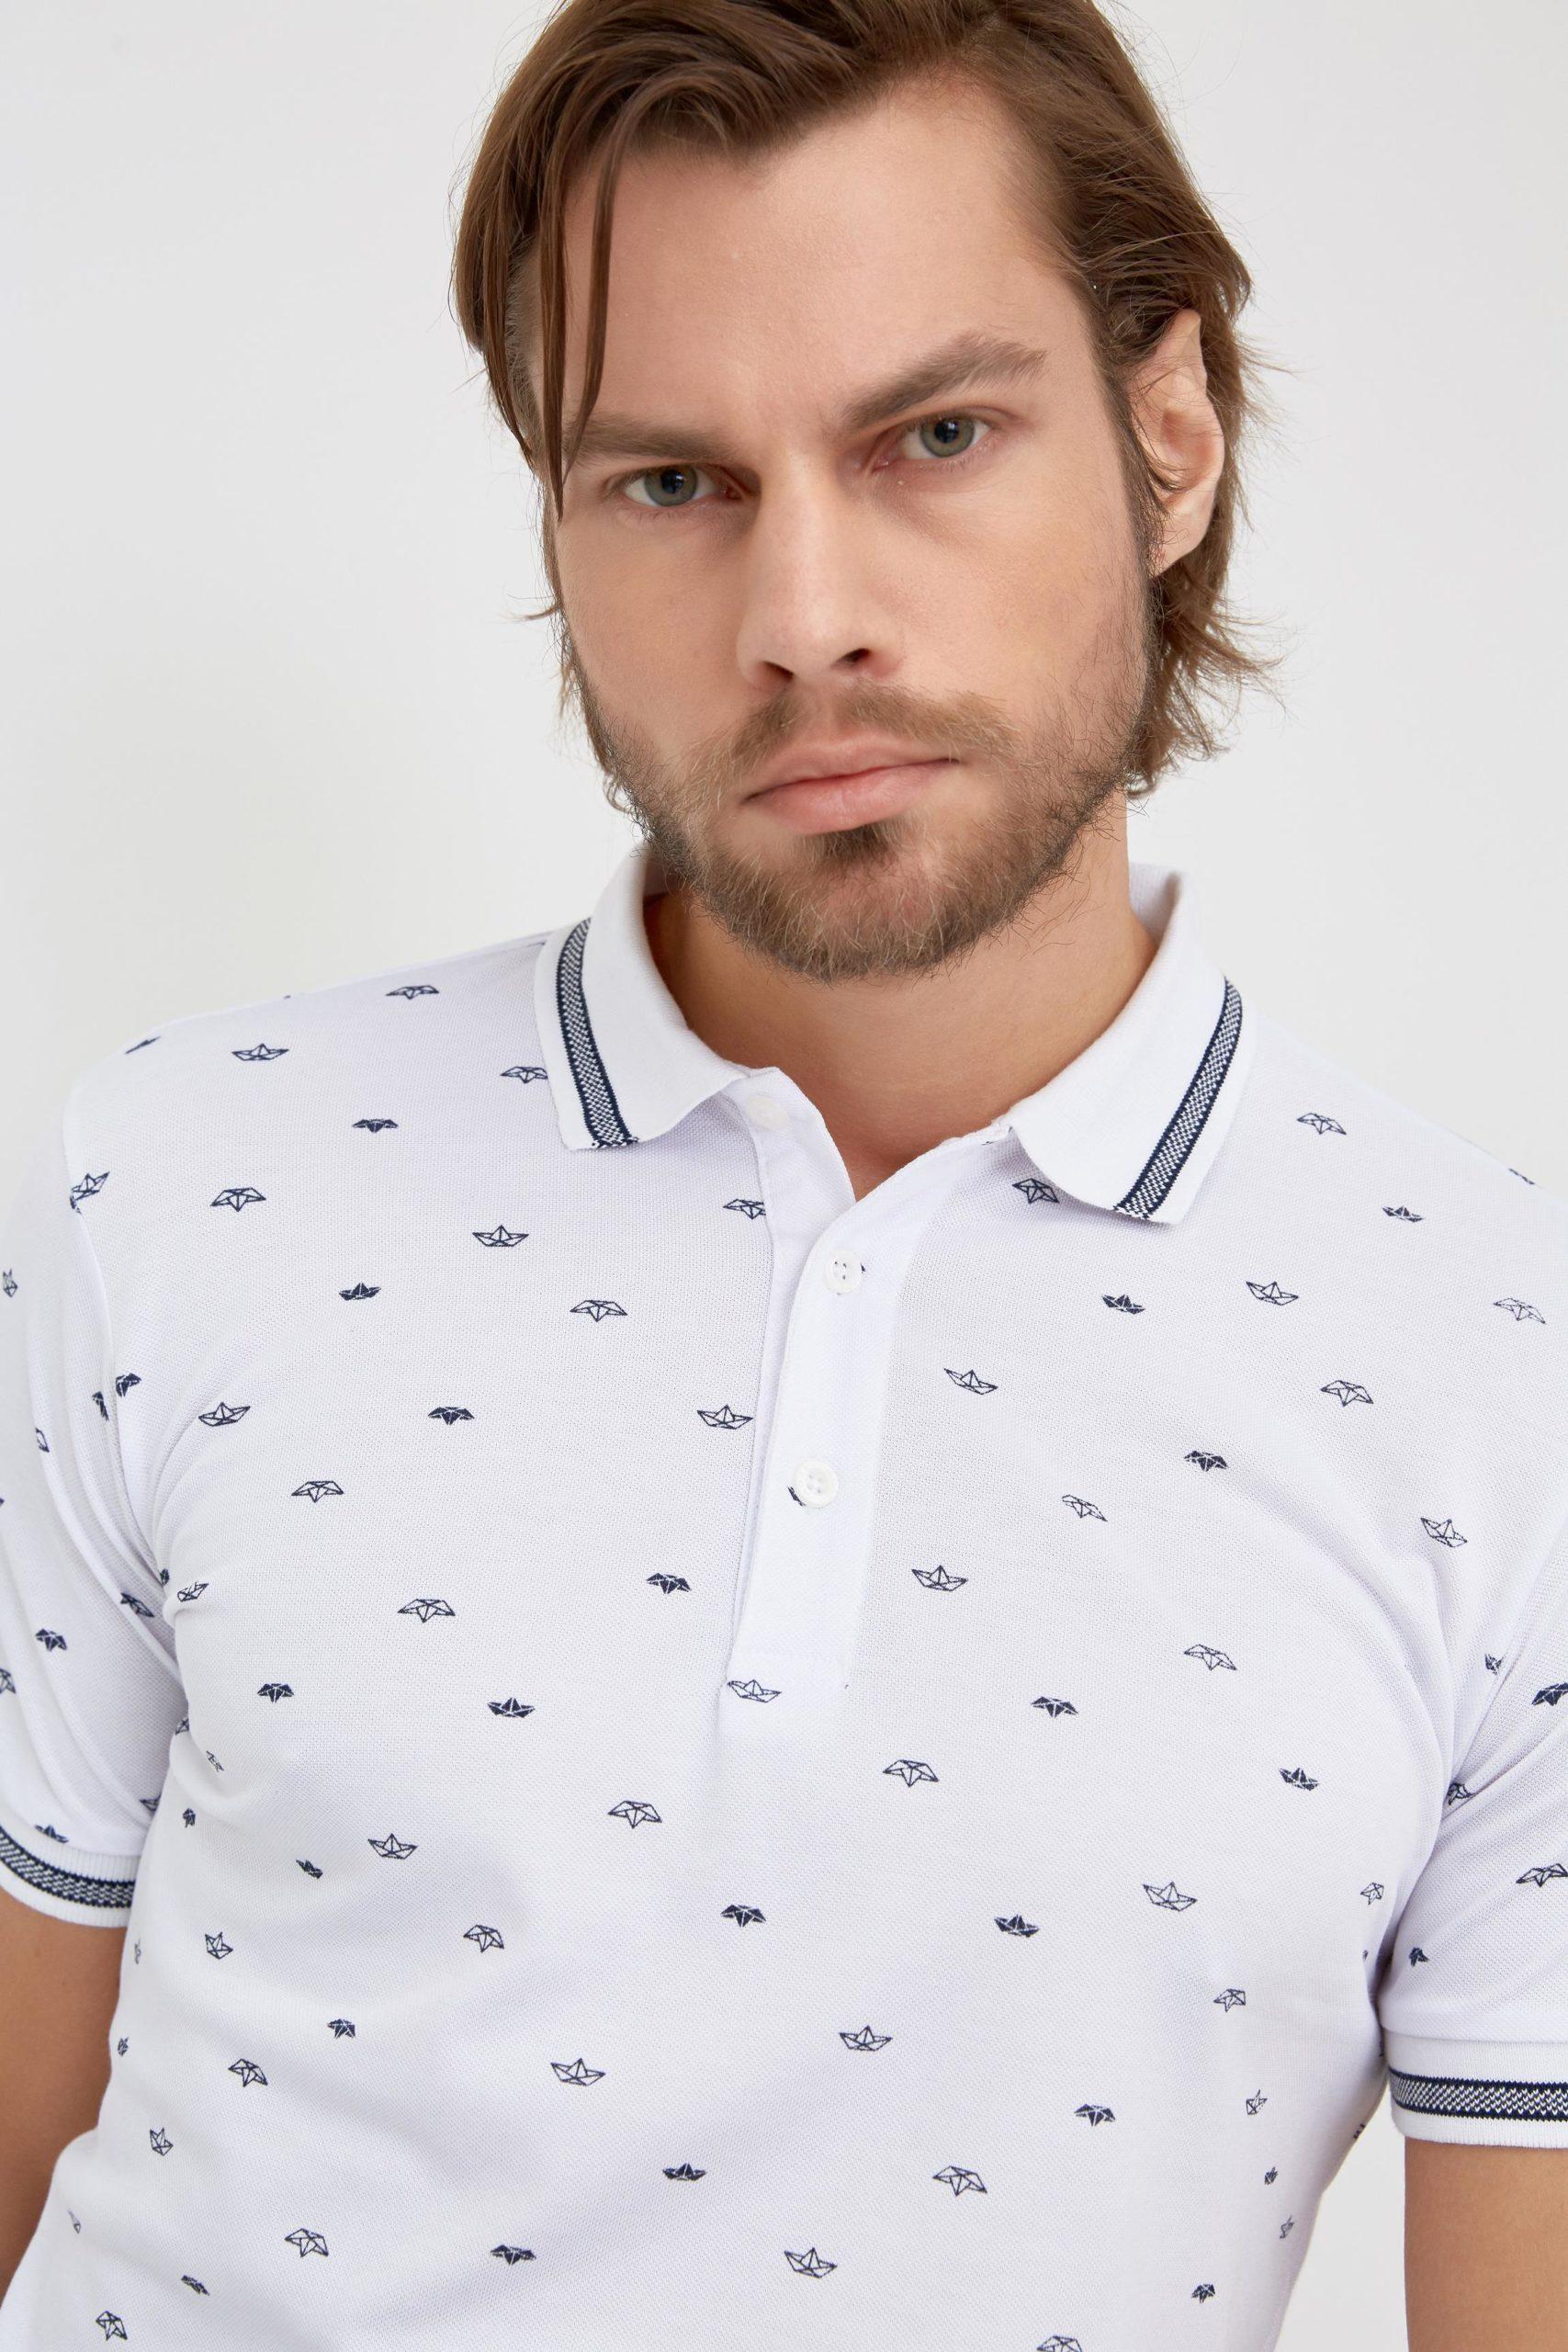 Мужская футболка поло 17-352300